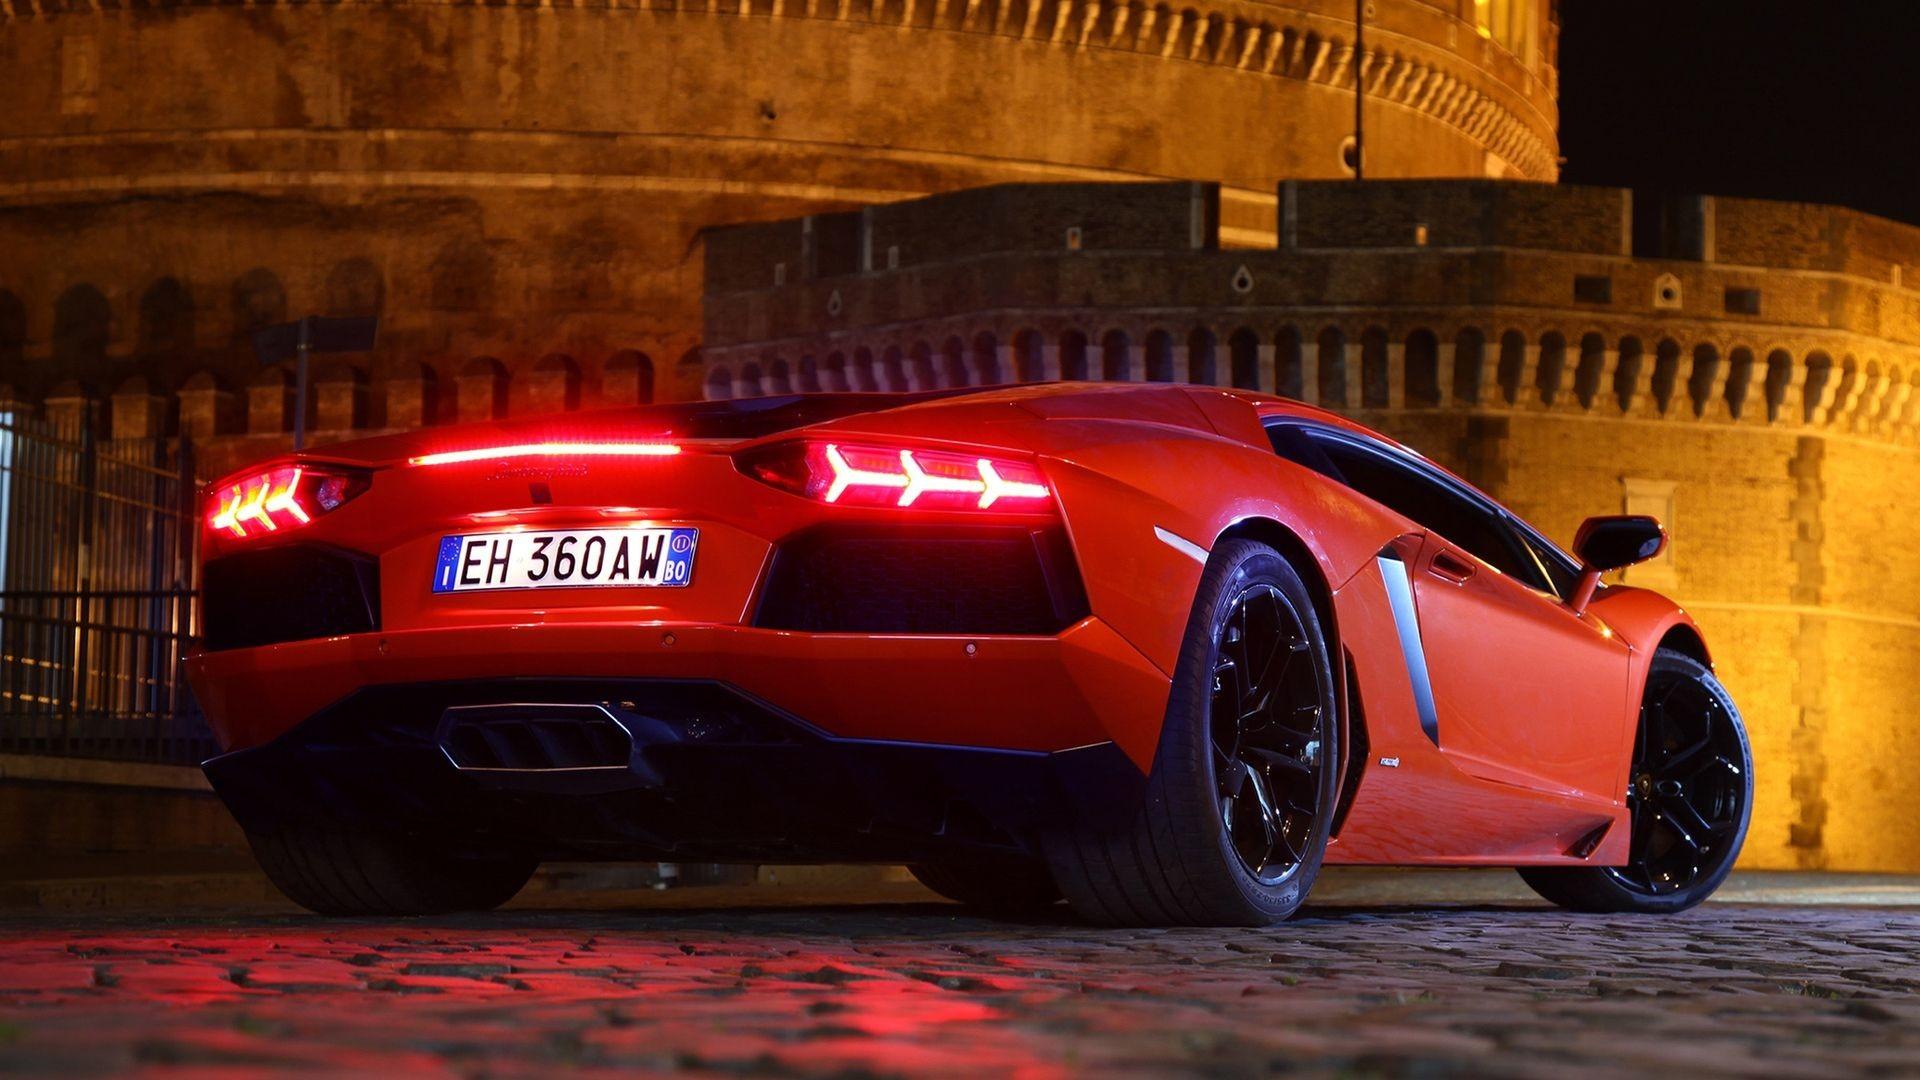 1920x1080 Red Lamborghini Aventador HD Wallpapers 1080p Cars